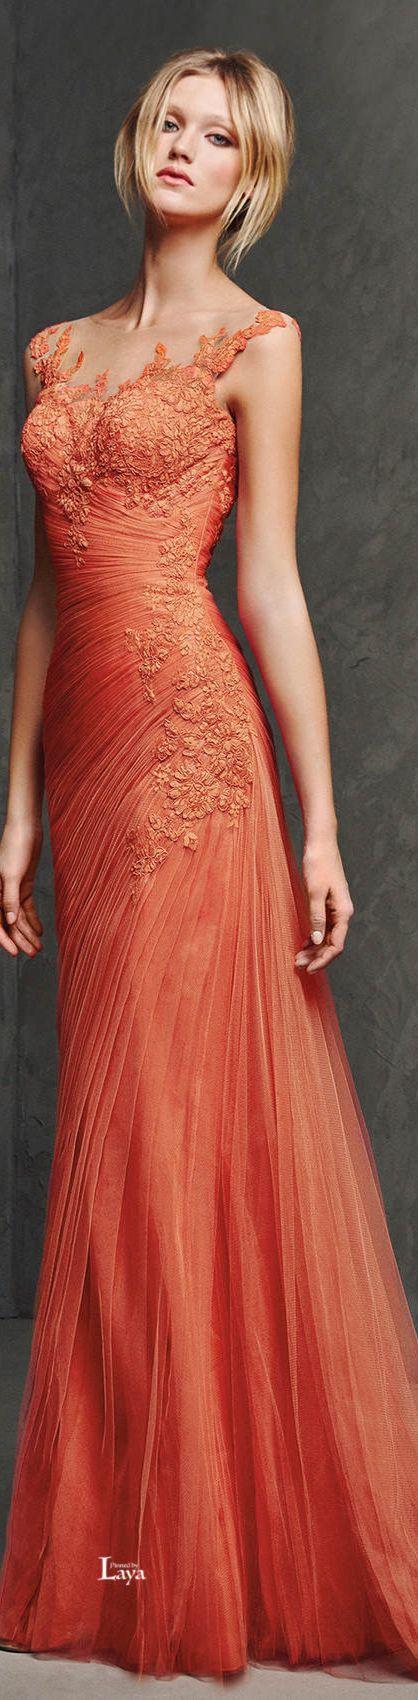 Tendencias en vestidos largos para invitadas e ventos